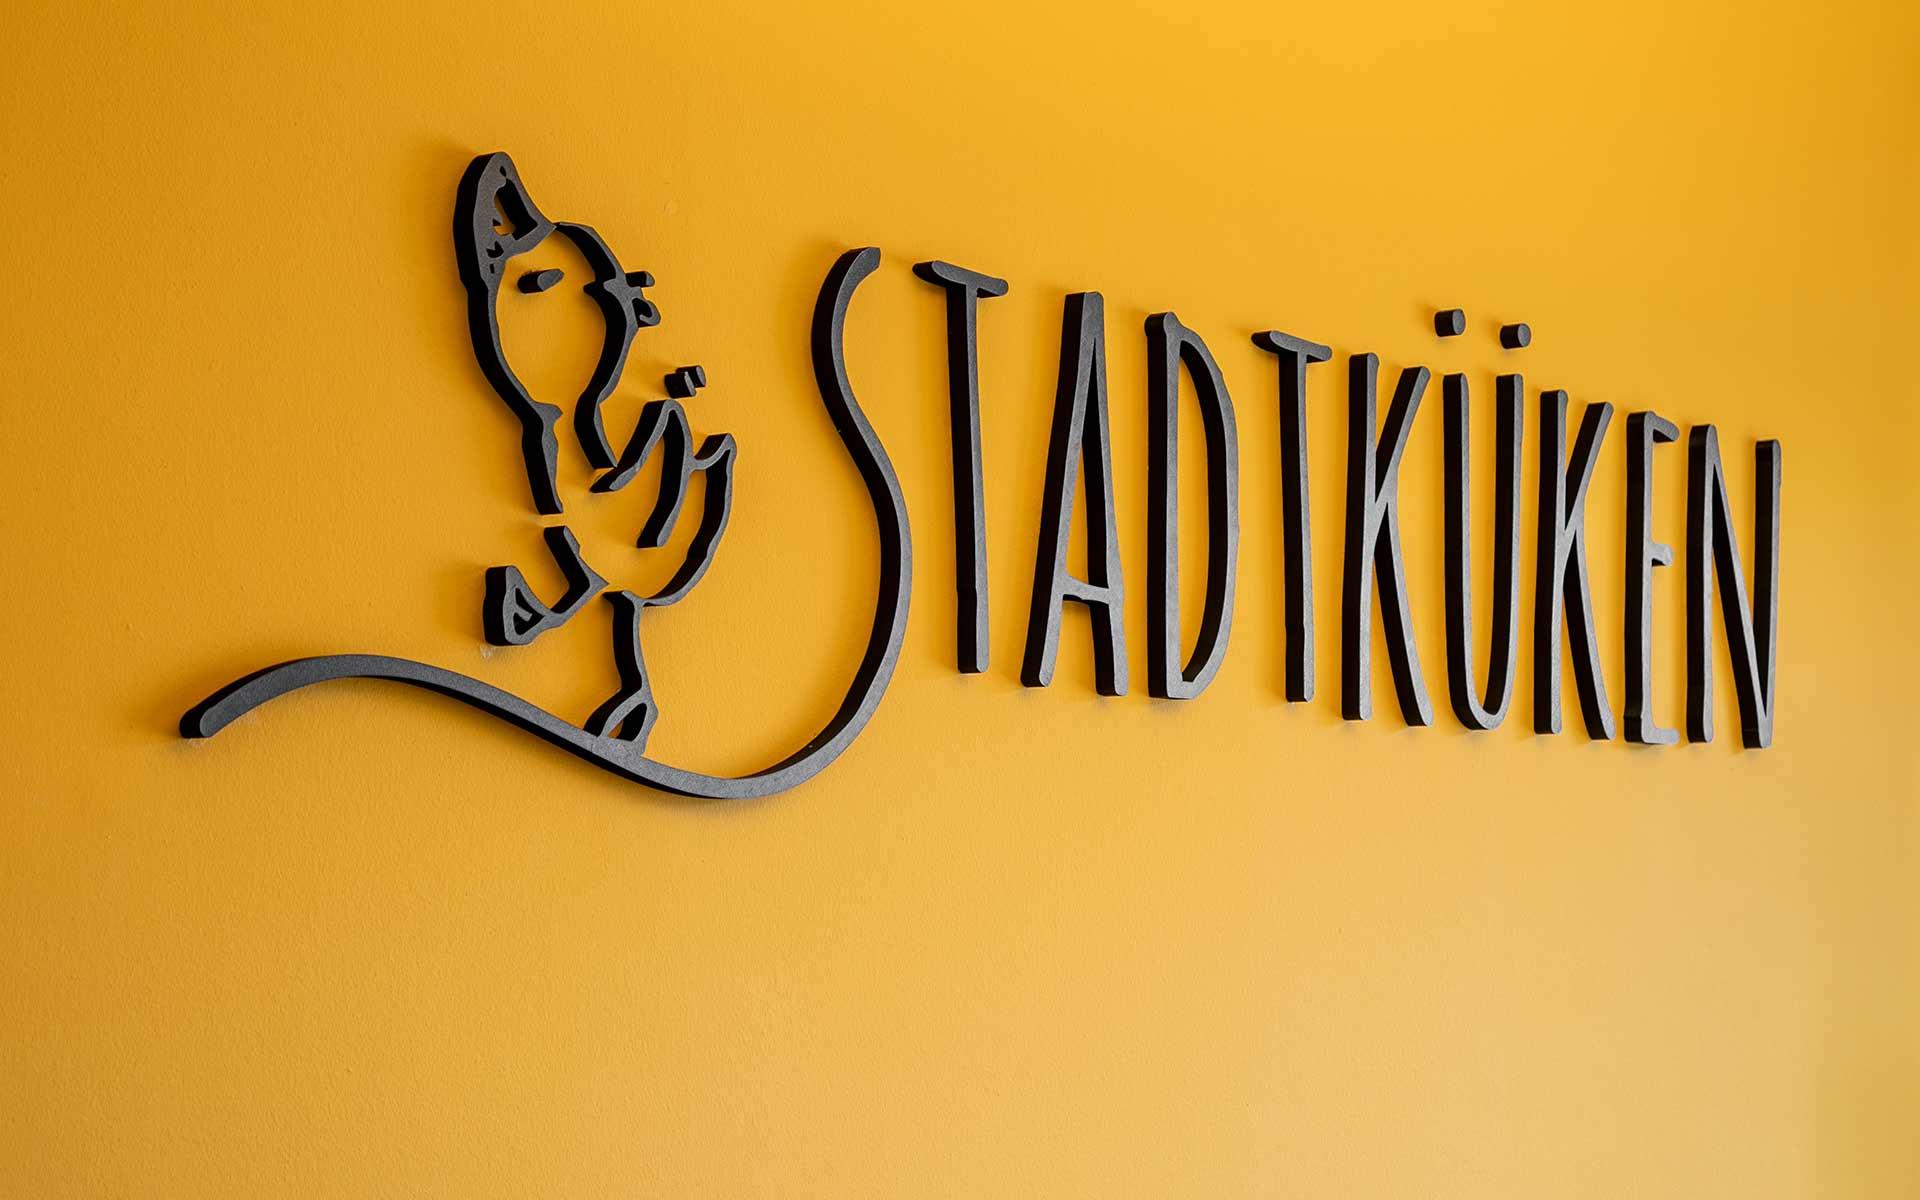 Stadtküken Kita Hamburg Logo